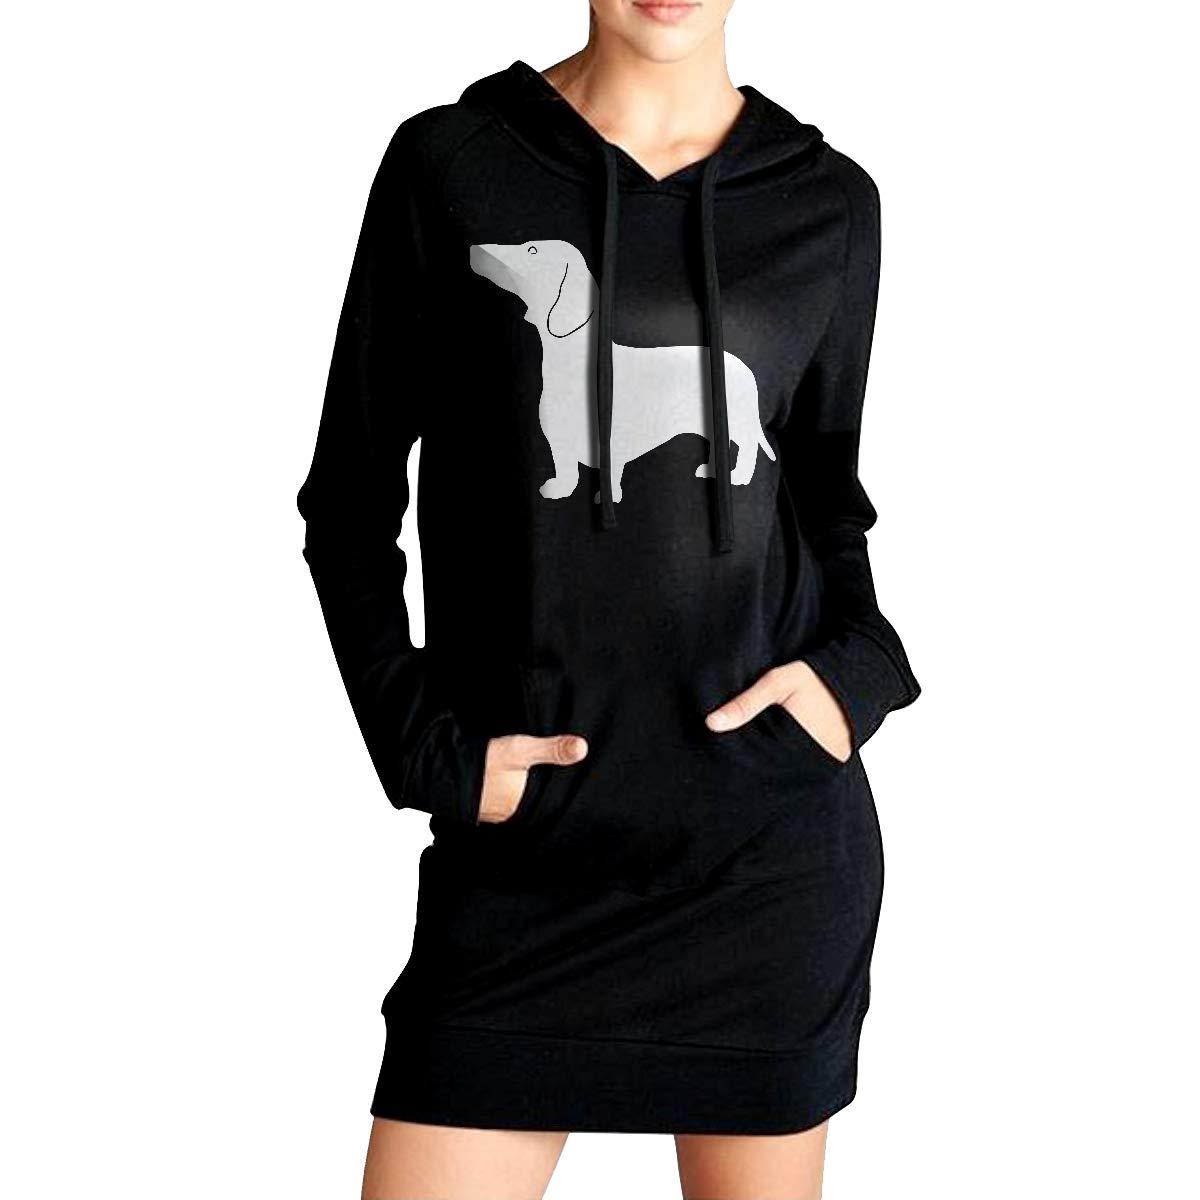 Dachshund-1 Sportswear with Pockets ADA/&KGH Womens Sports Sweatshirt Long Hoodie Dress